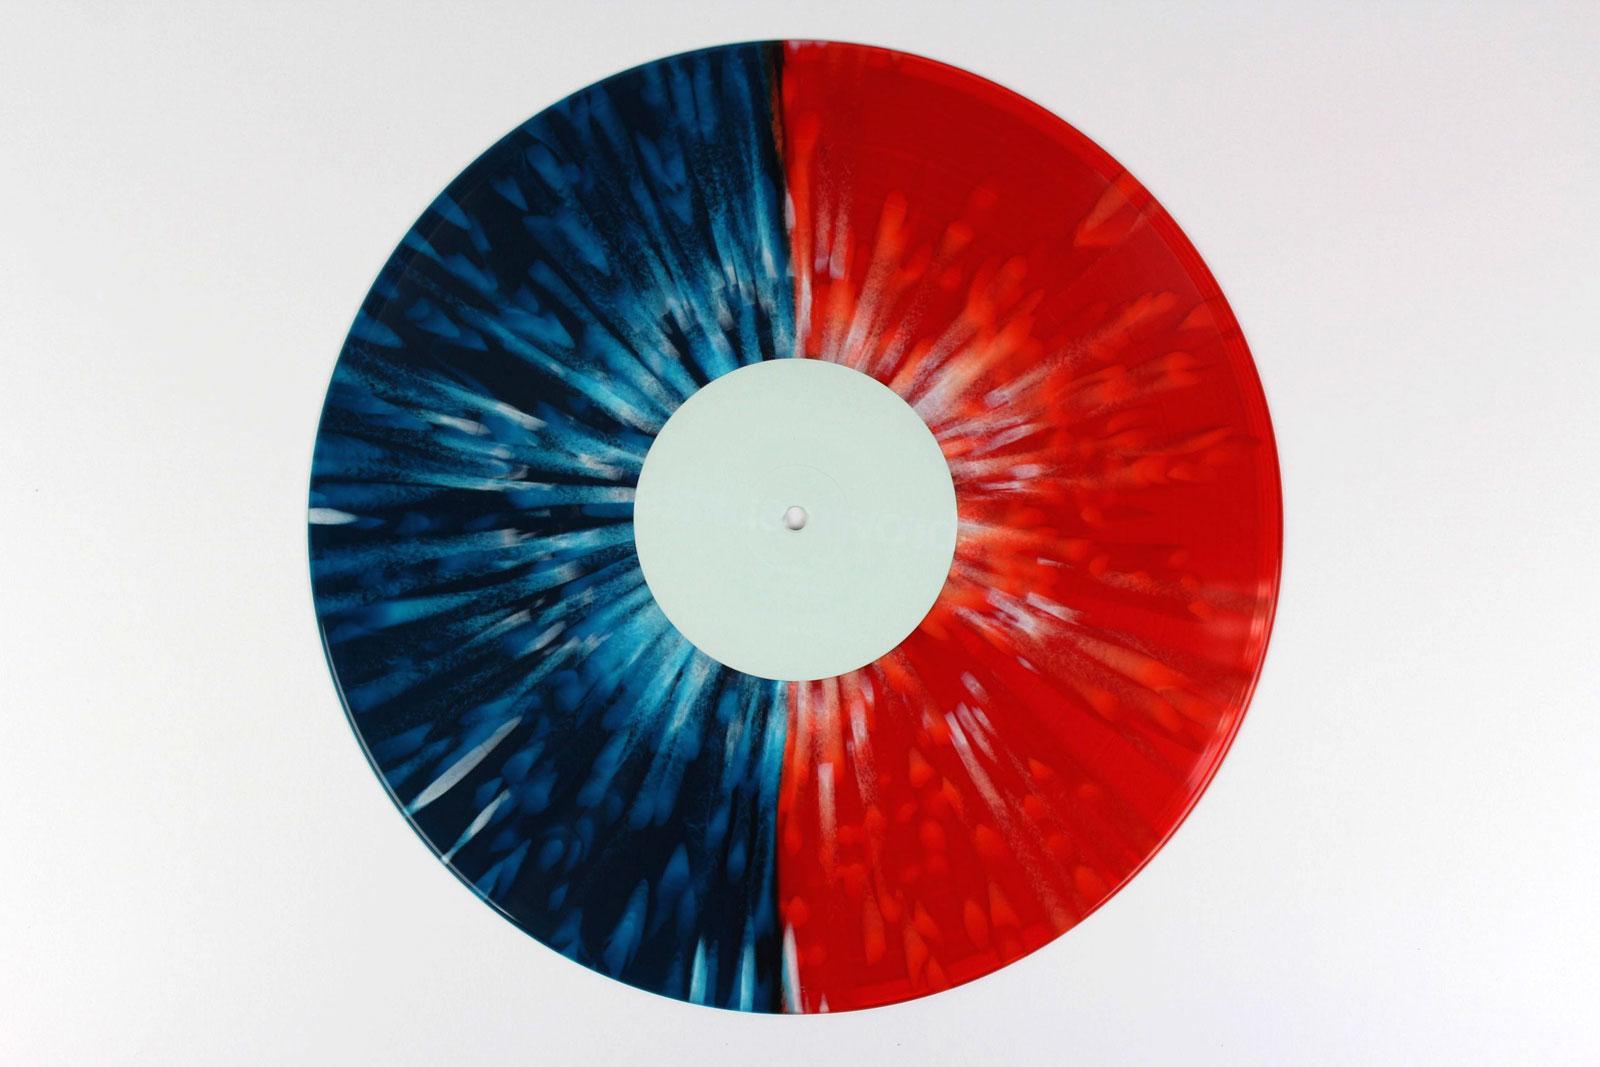 blue 50% + green 50% / red opaque / Splatter white